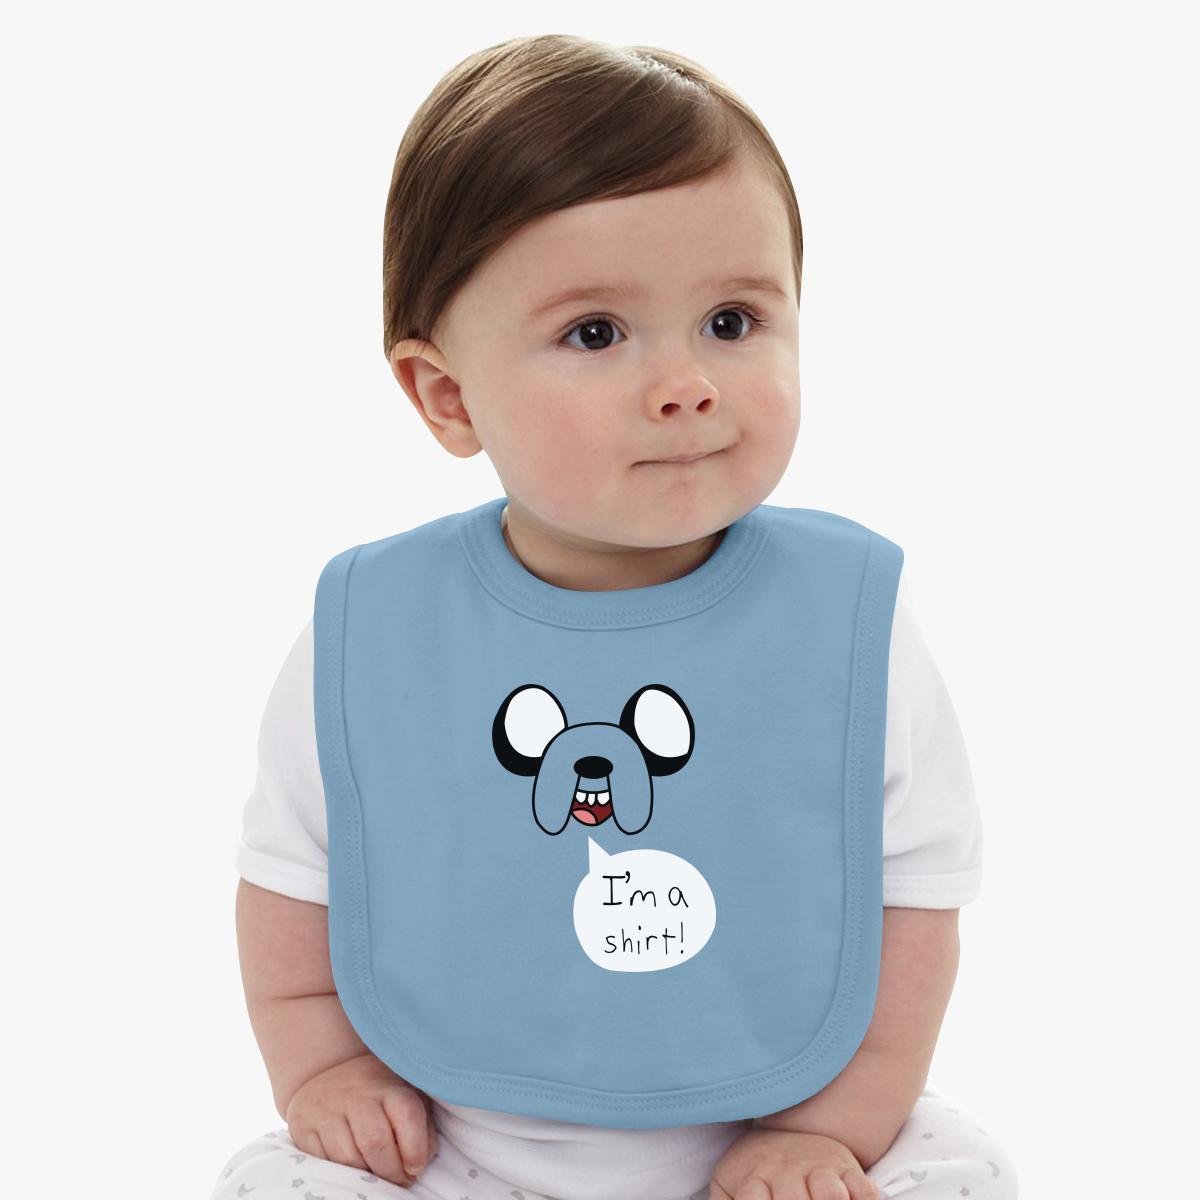 JAKE THE ADVENTURE TIME Baby Bib - Customon